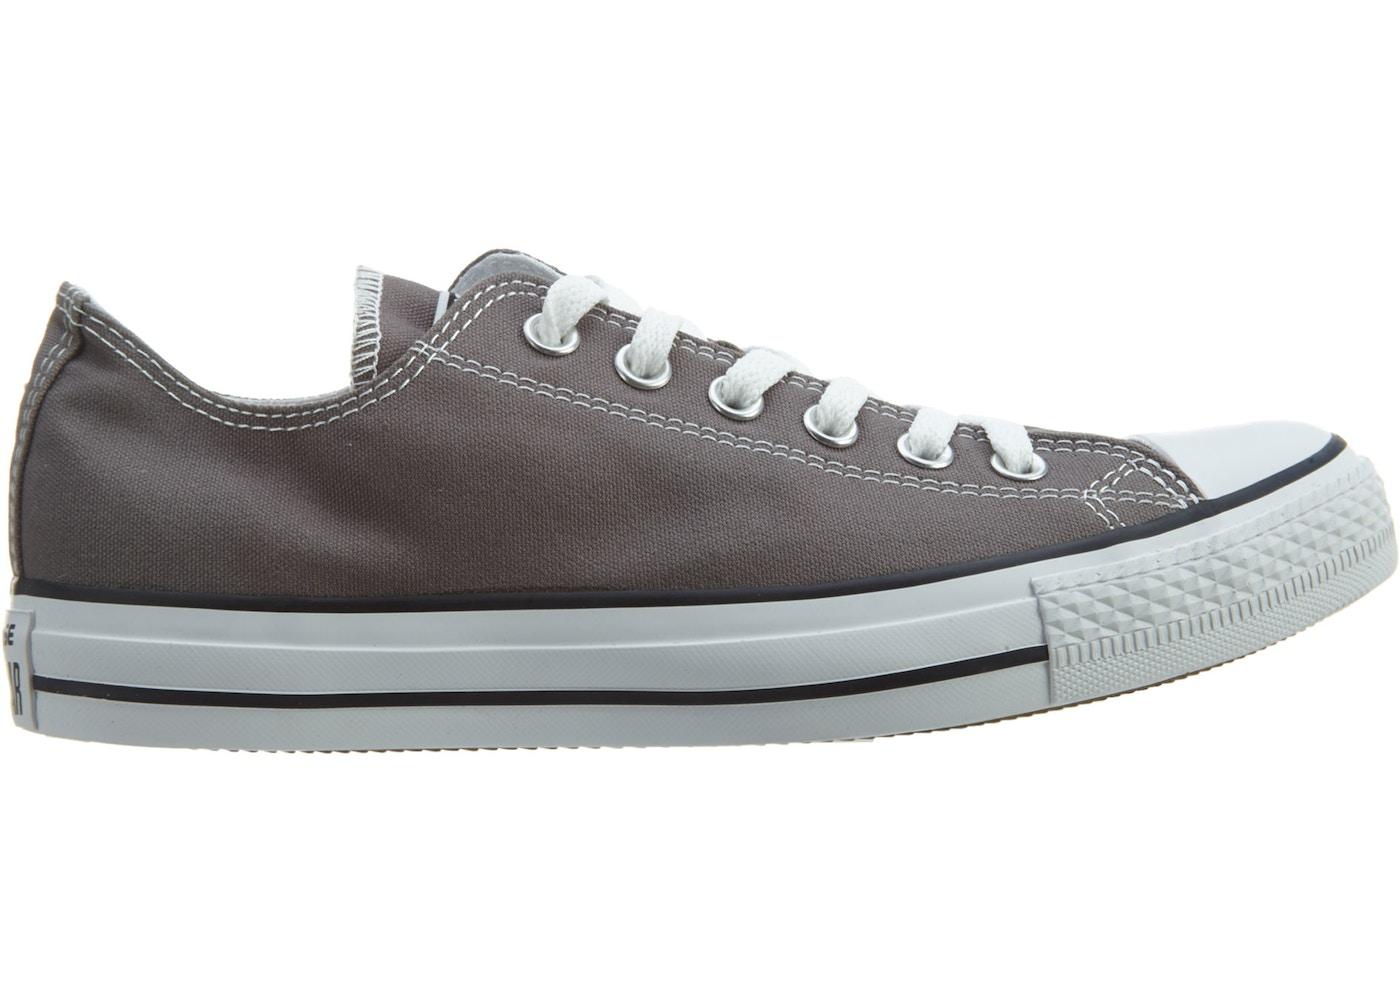 08427e54f2b Converse Chuck Taylor All Stars Ox Shoe - Charcoal - 1J794C